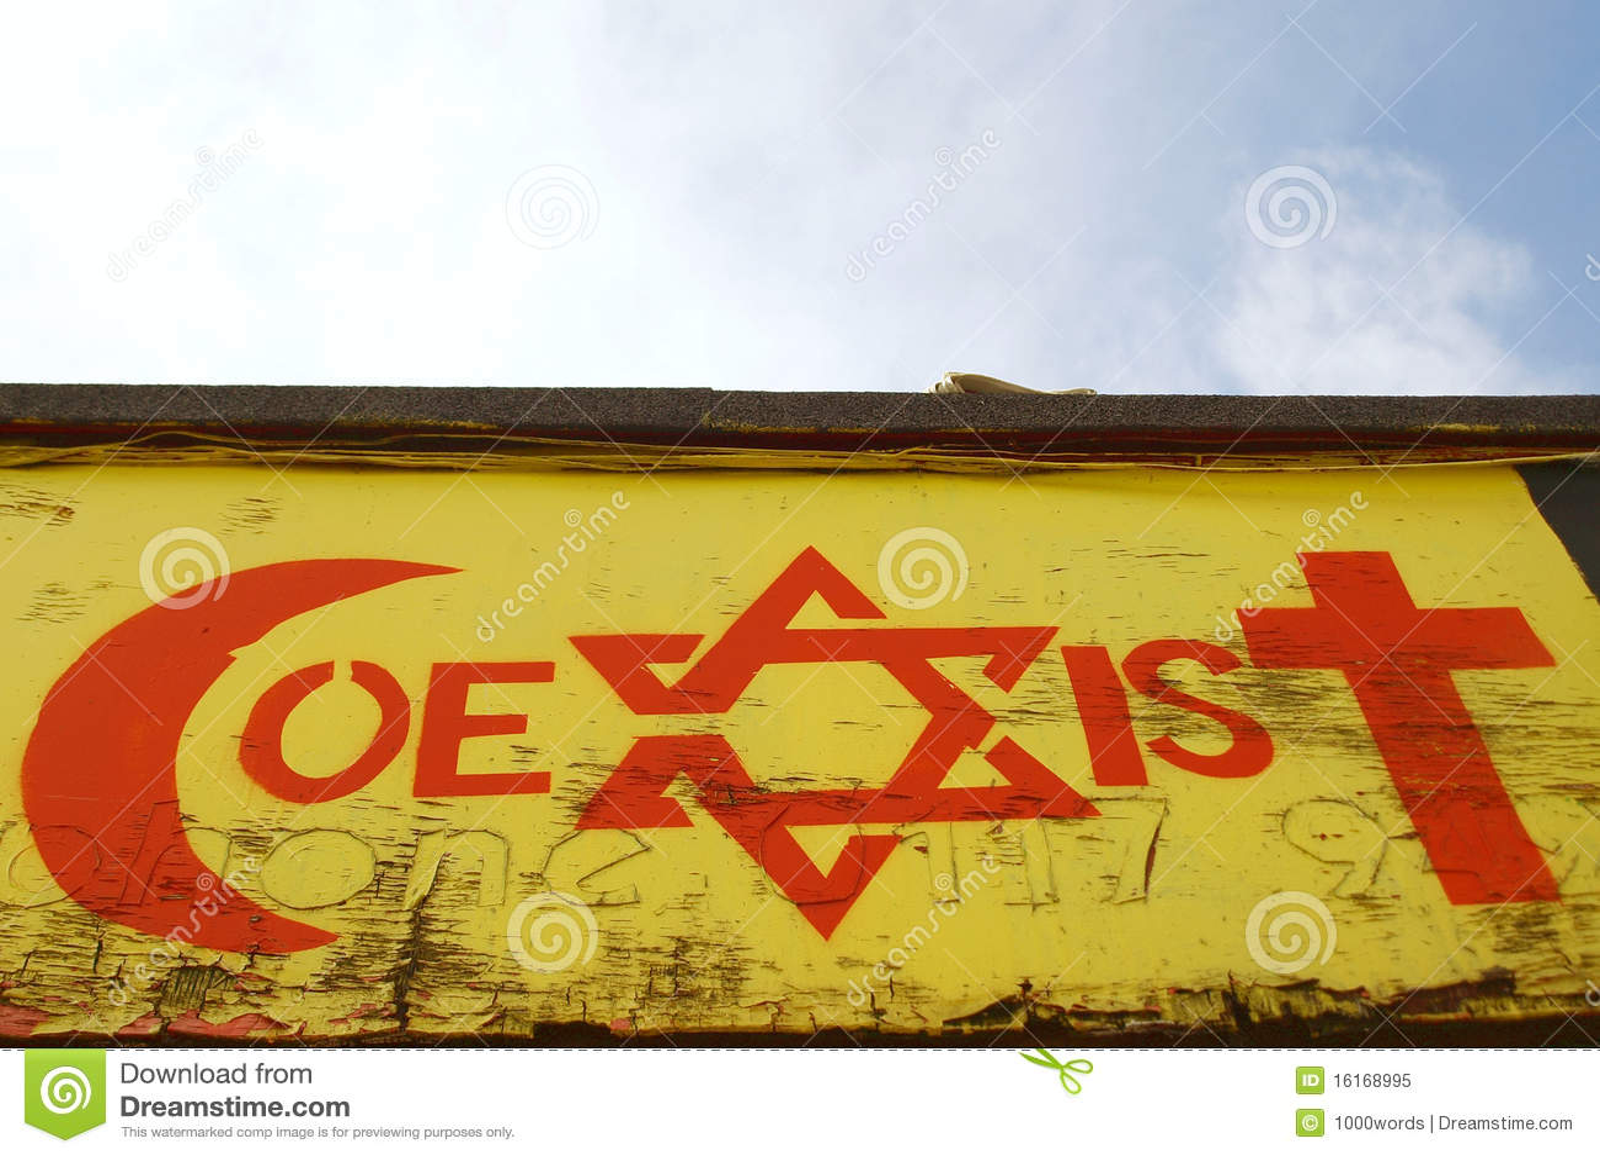 Godsdienstige Tolerantie Themed Graffiti